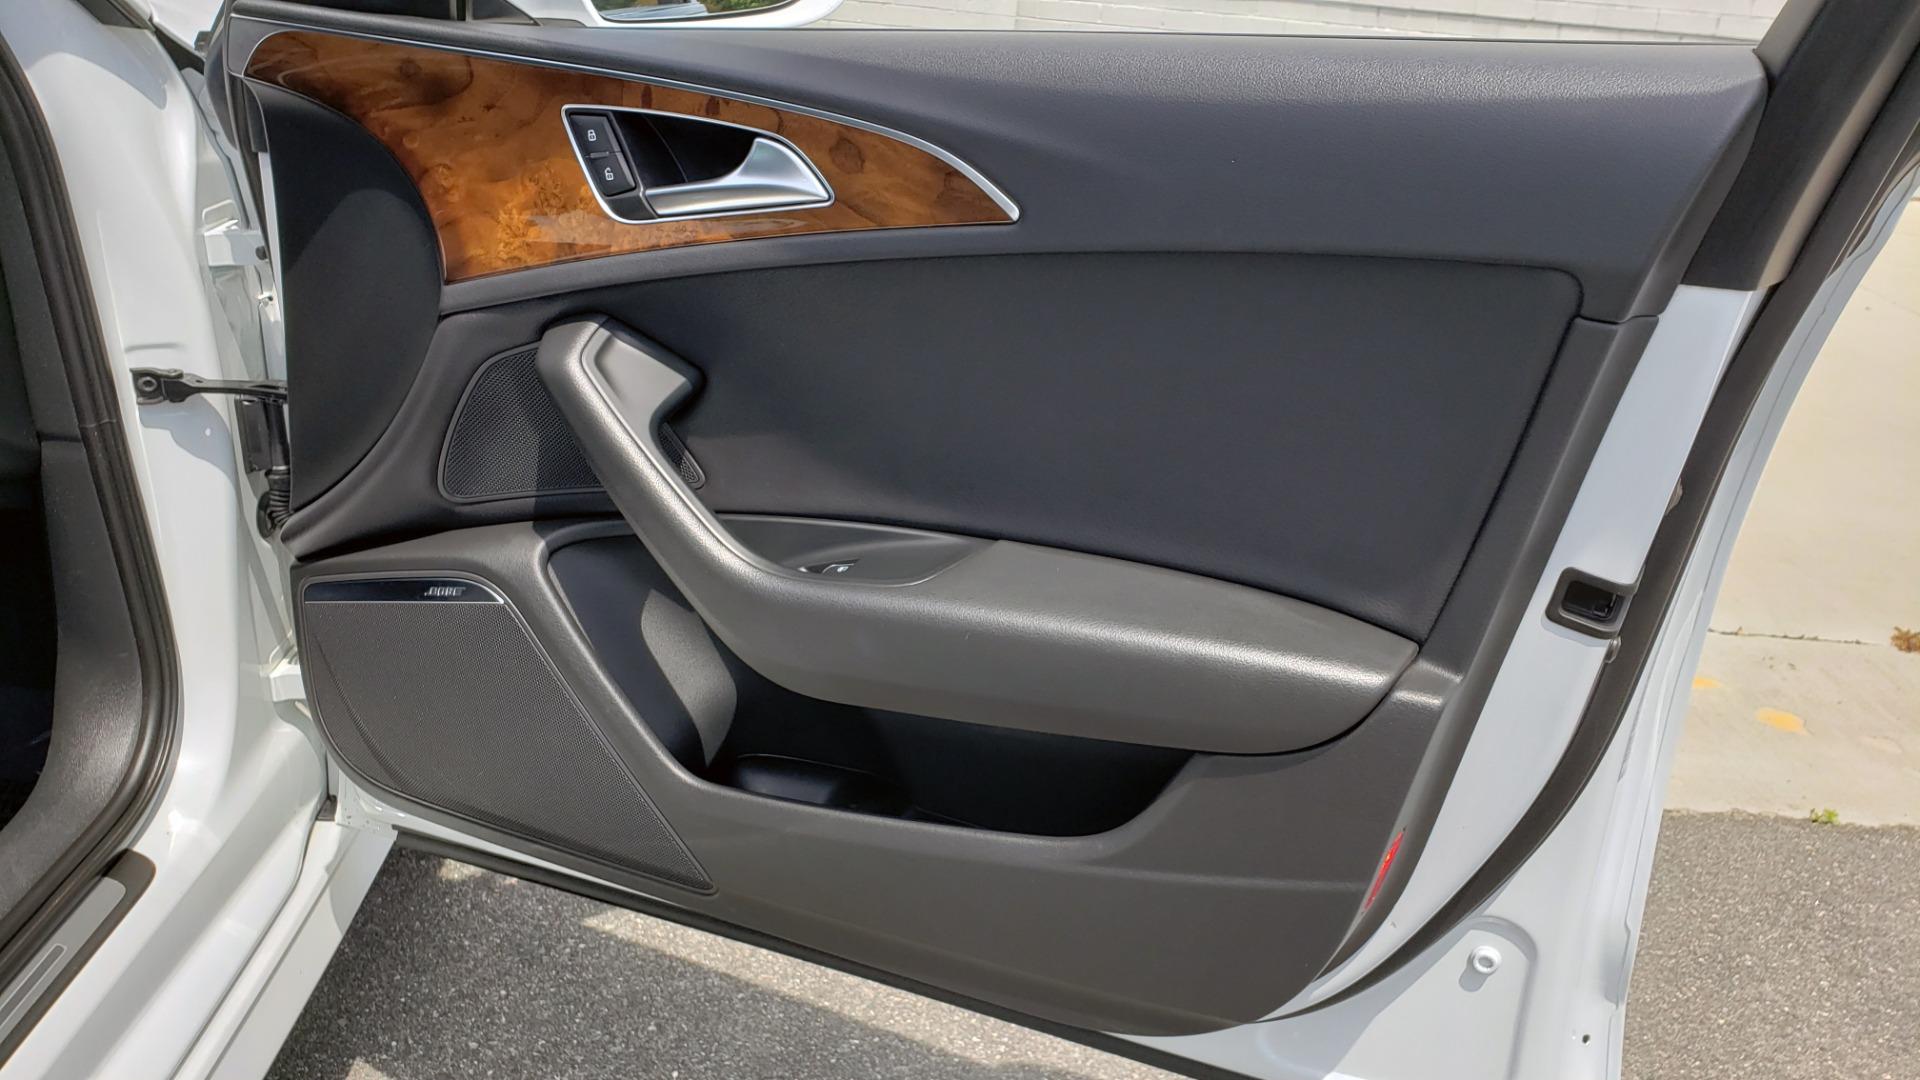 Used 2017 Audi A6 PRESTIGE SEDAN 3.0T / NAV / SUNROOF / BLACK OPTIC / CLD WTHR / REARVIEW for sale $30,797 at Formula Imports in Charlotte NC 28227 69